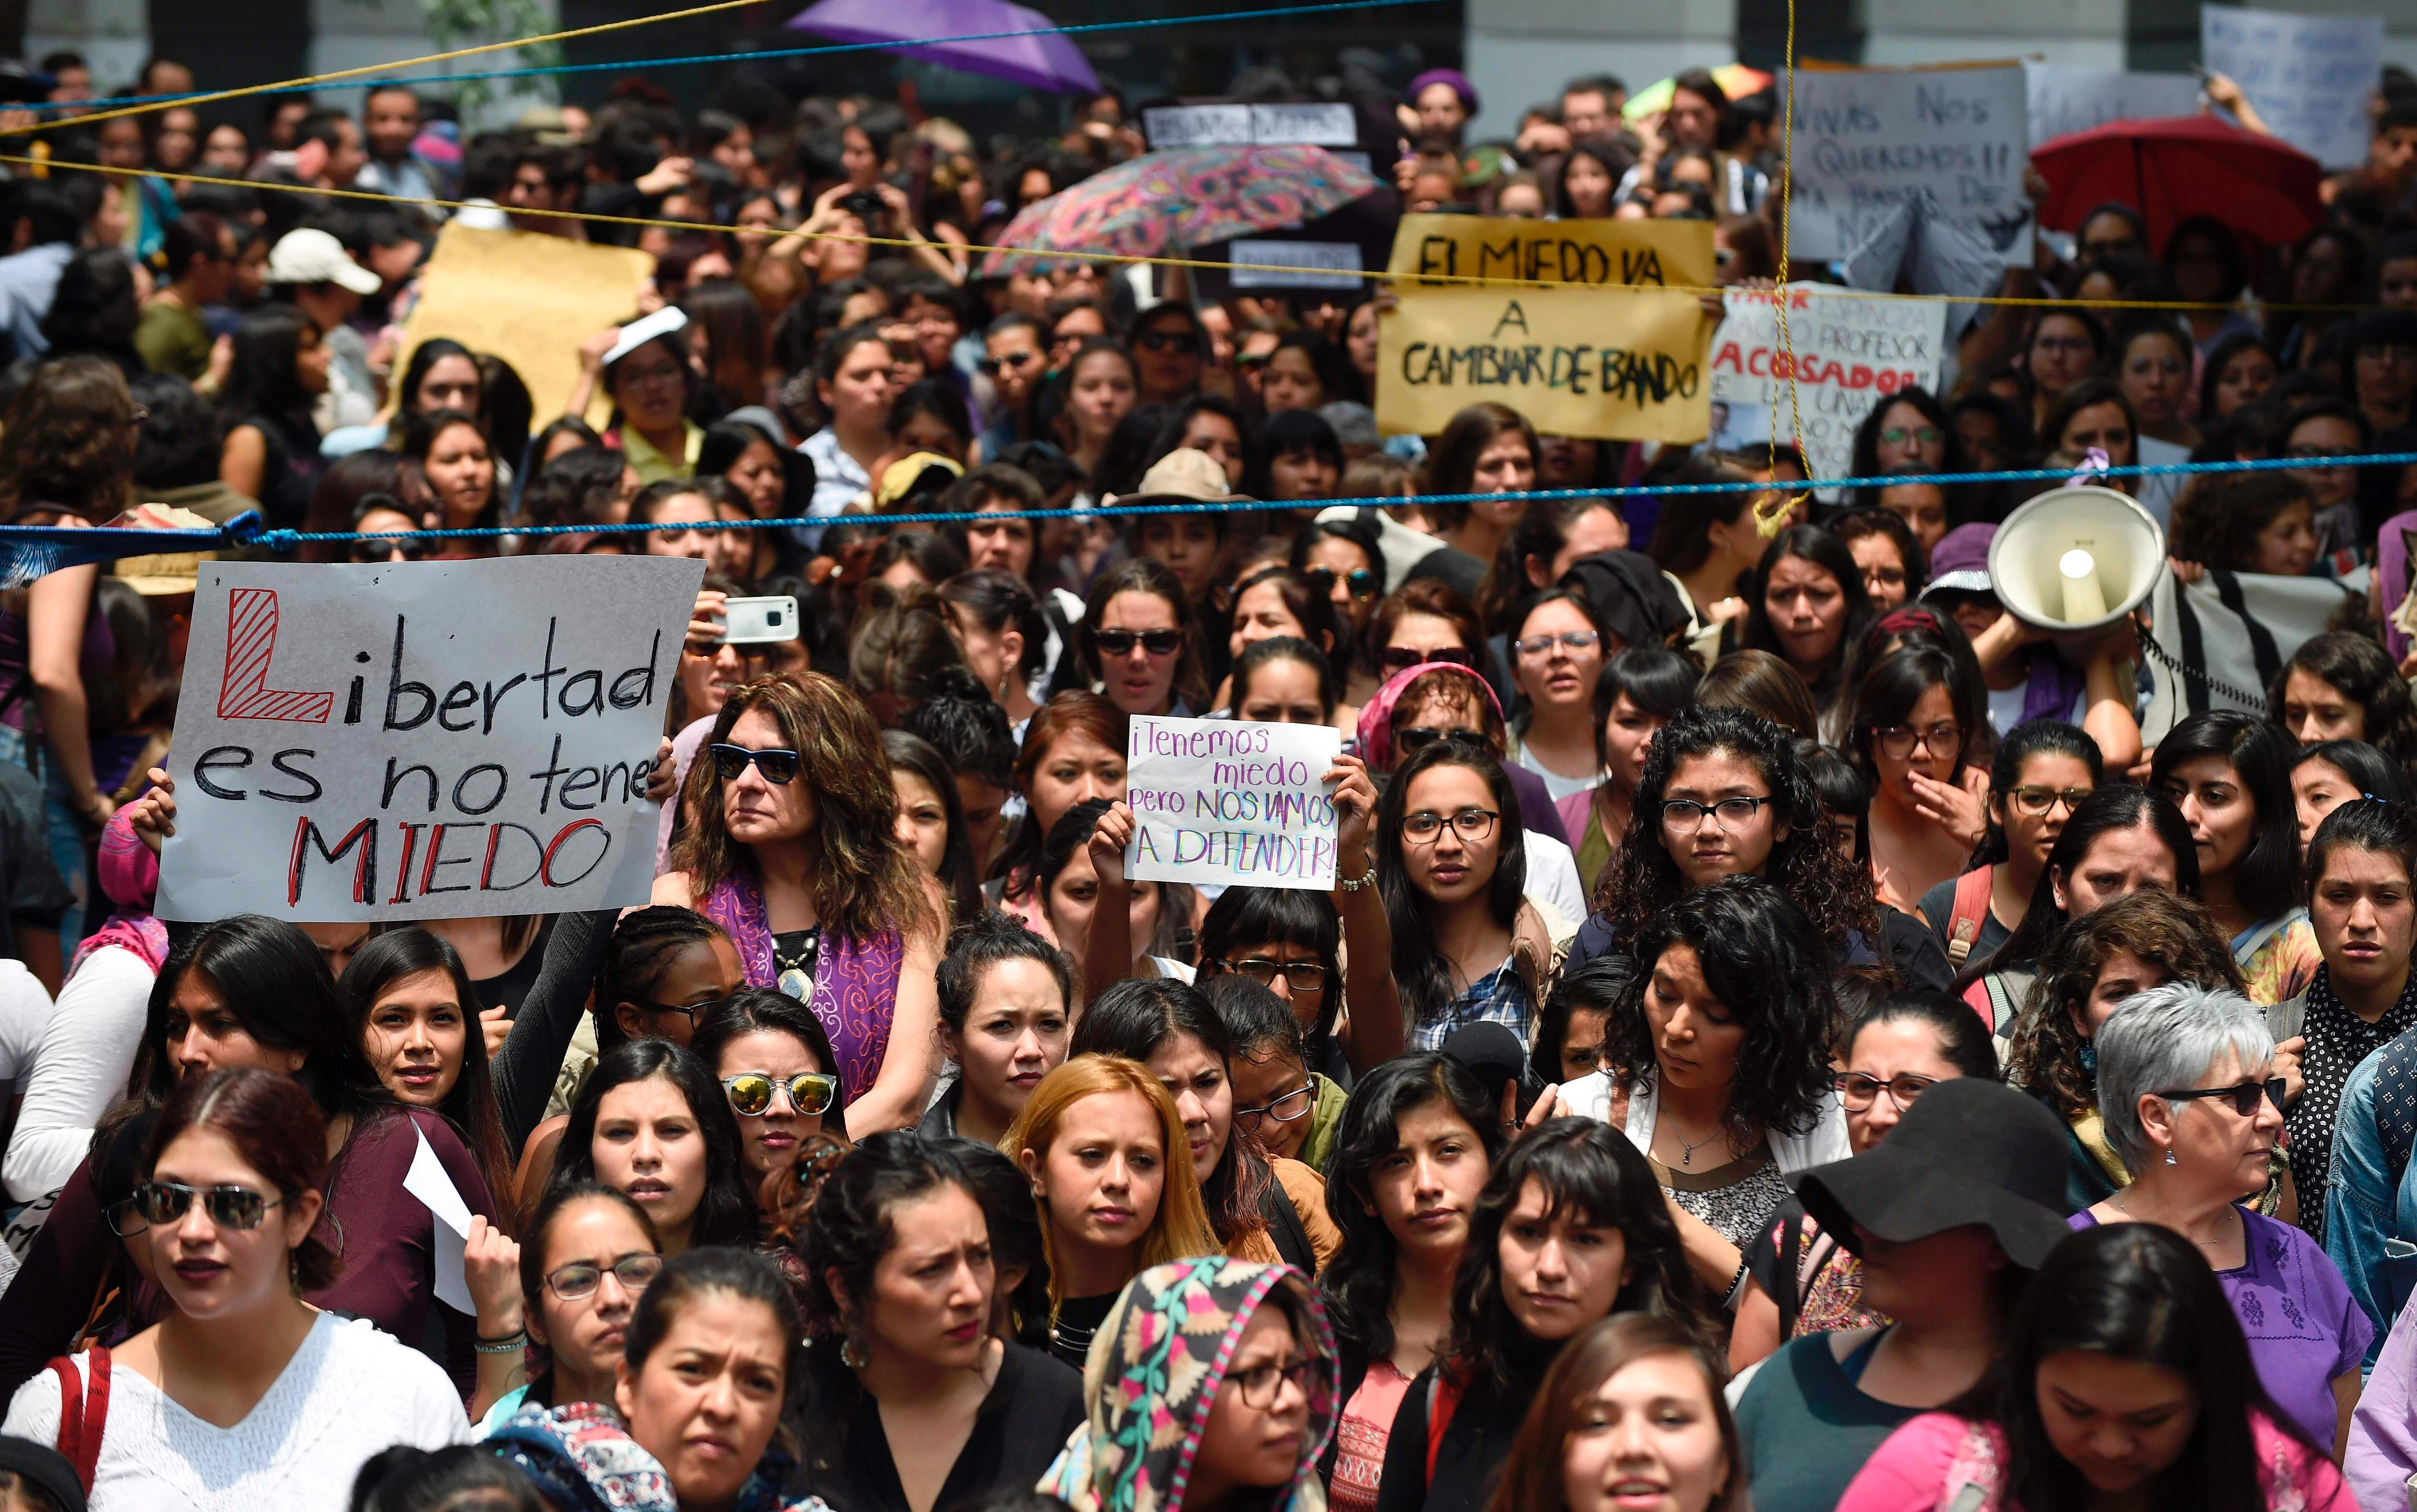 Exigen comparecer a funcionarios por feminicidios en sinaloa